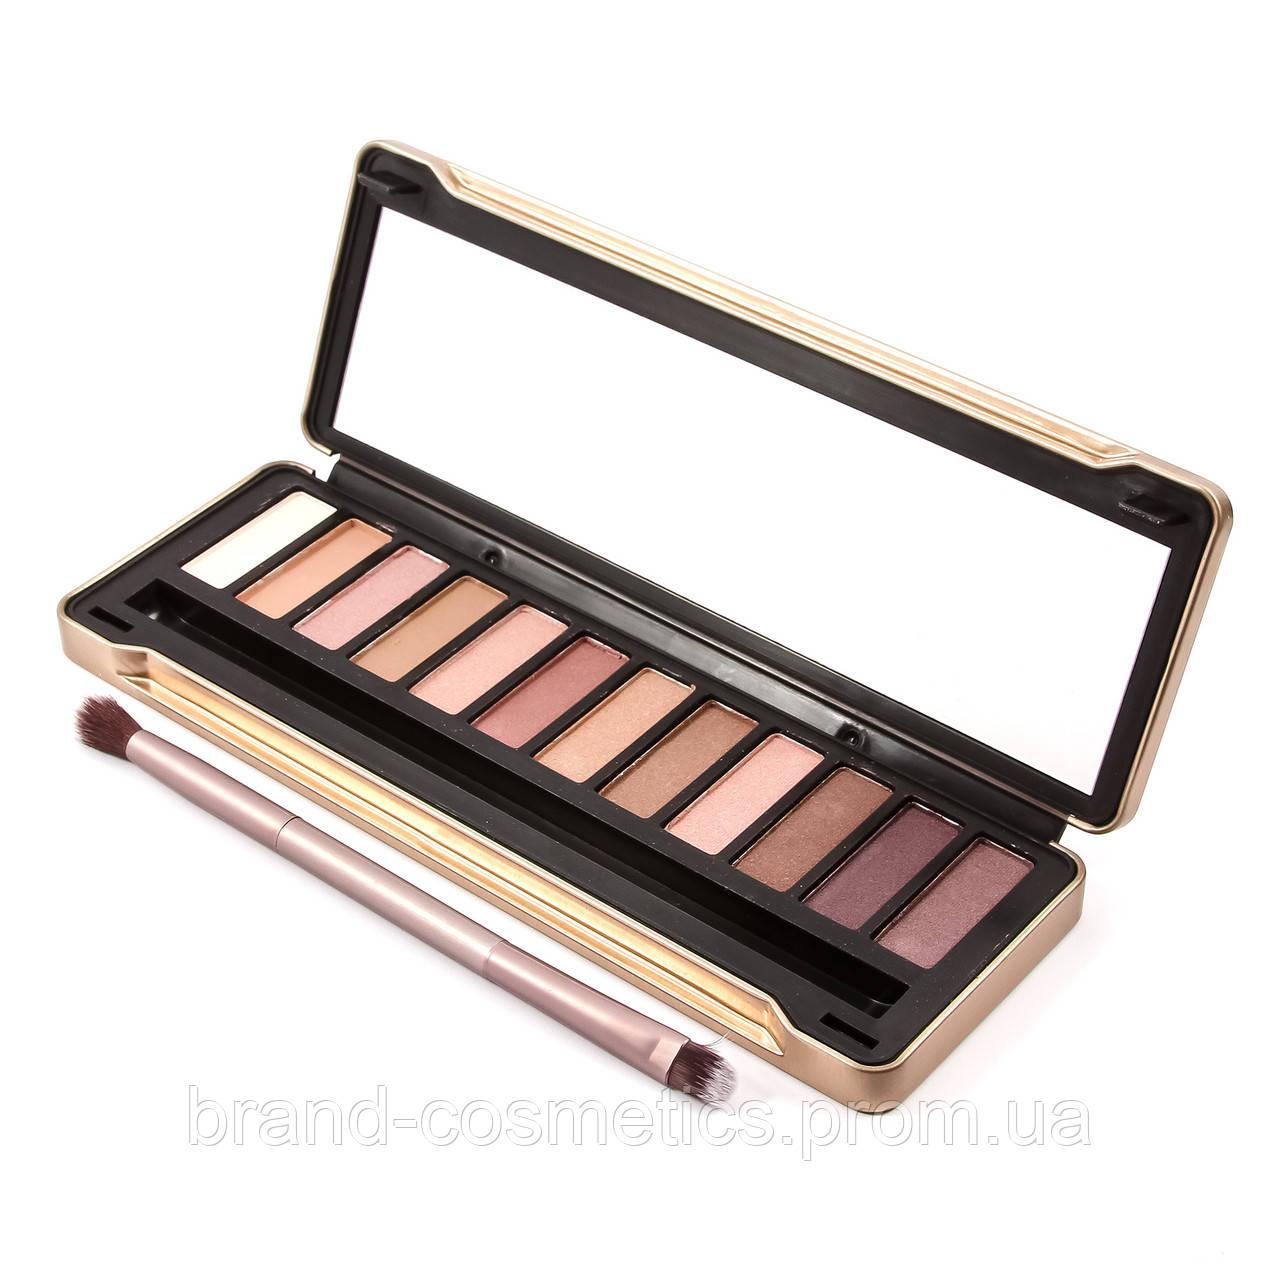 Тени для век Beauty Creations Nudes Eyeshadow Palette